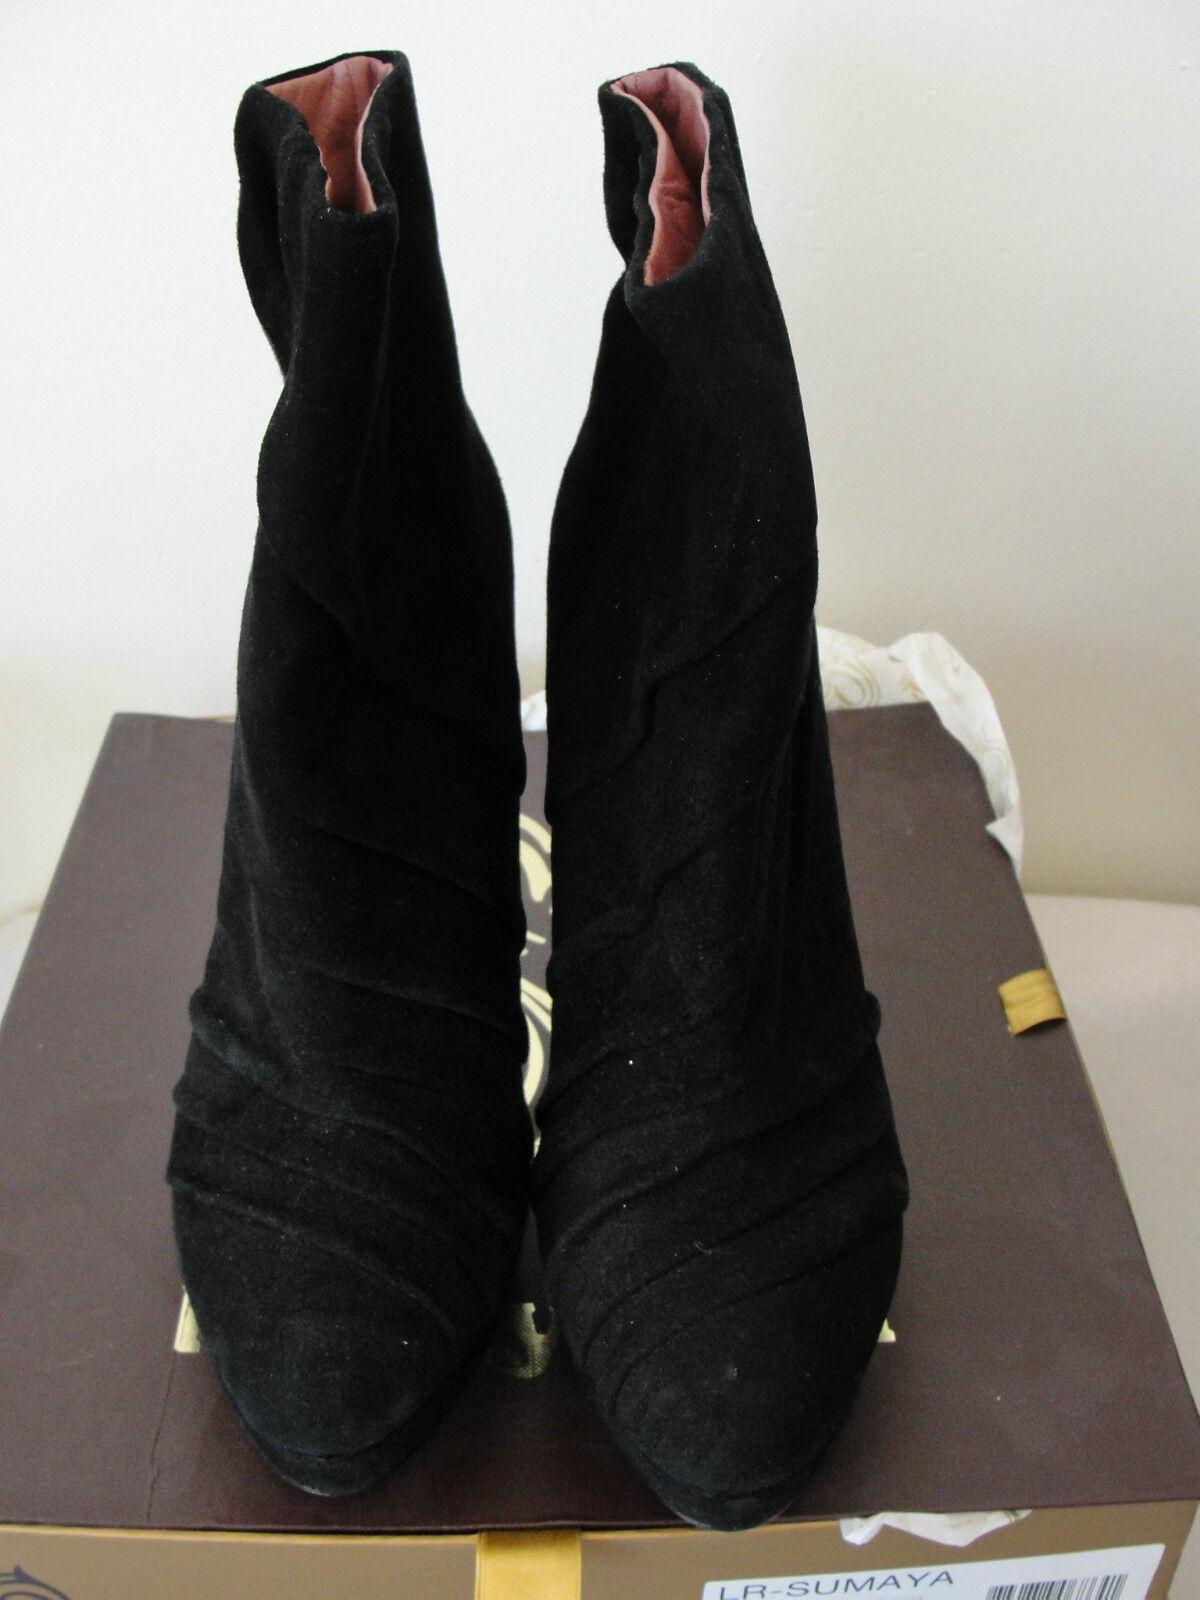 275 Luxury Rebel Sumaya Sumaya Sumaya Women Suede Ankle Boots BLK 41 10.5 f8e137